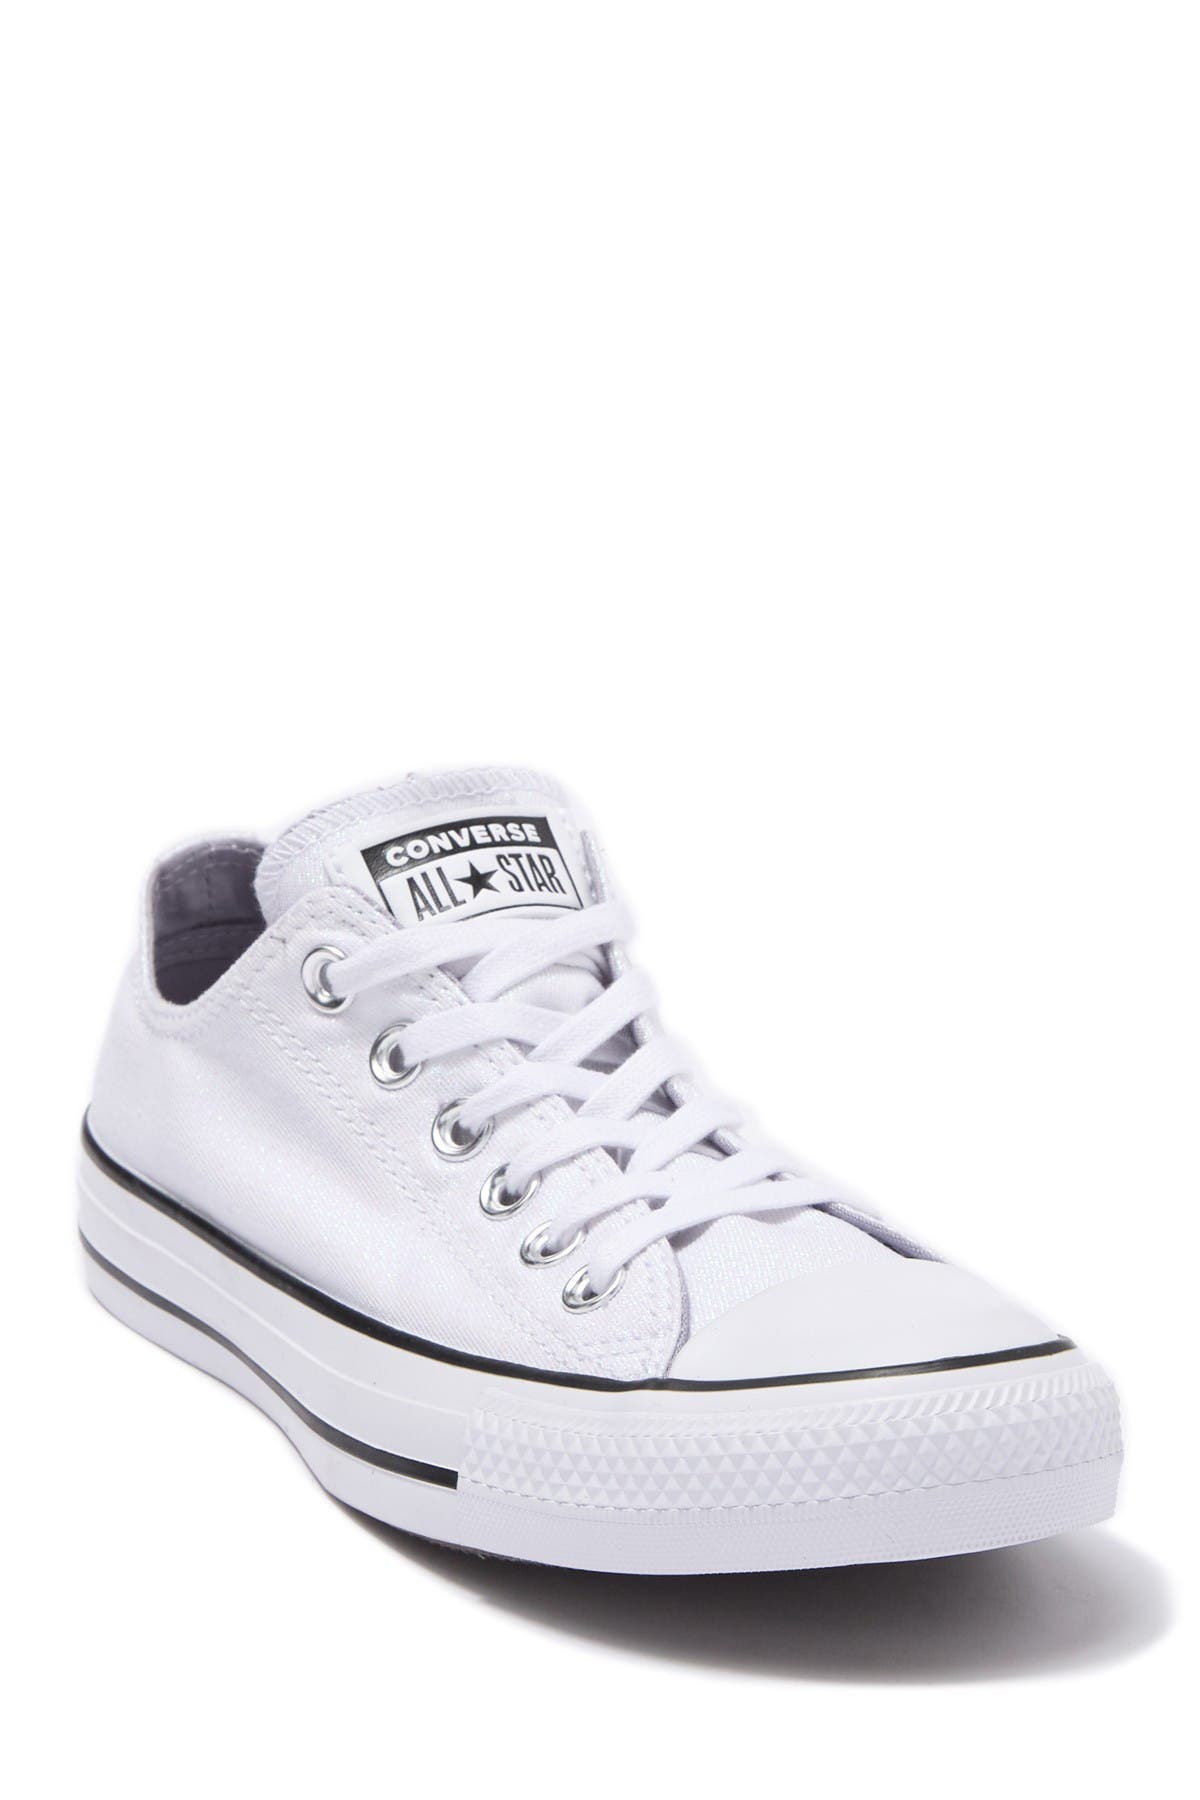 Image of Converse Chuck Taylor All Star Precious Metal Oxford Sneaker